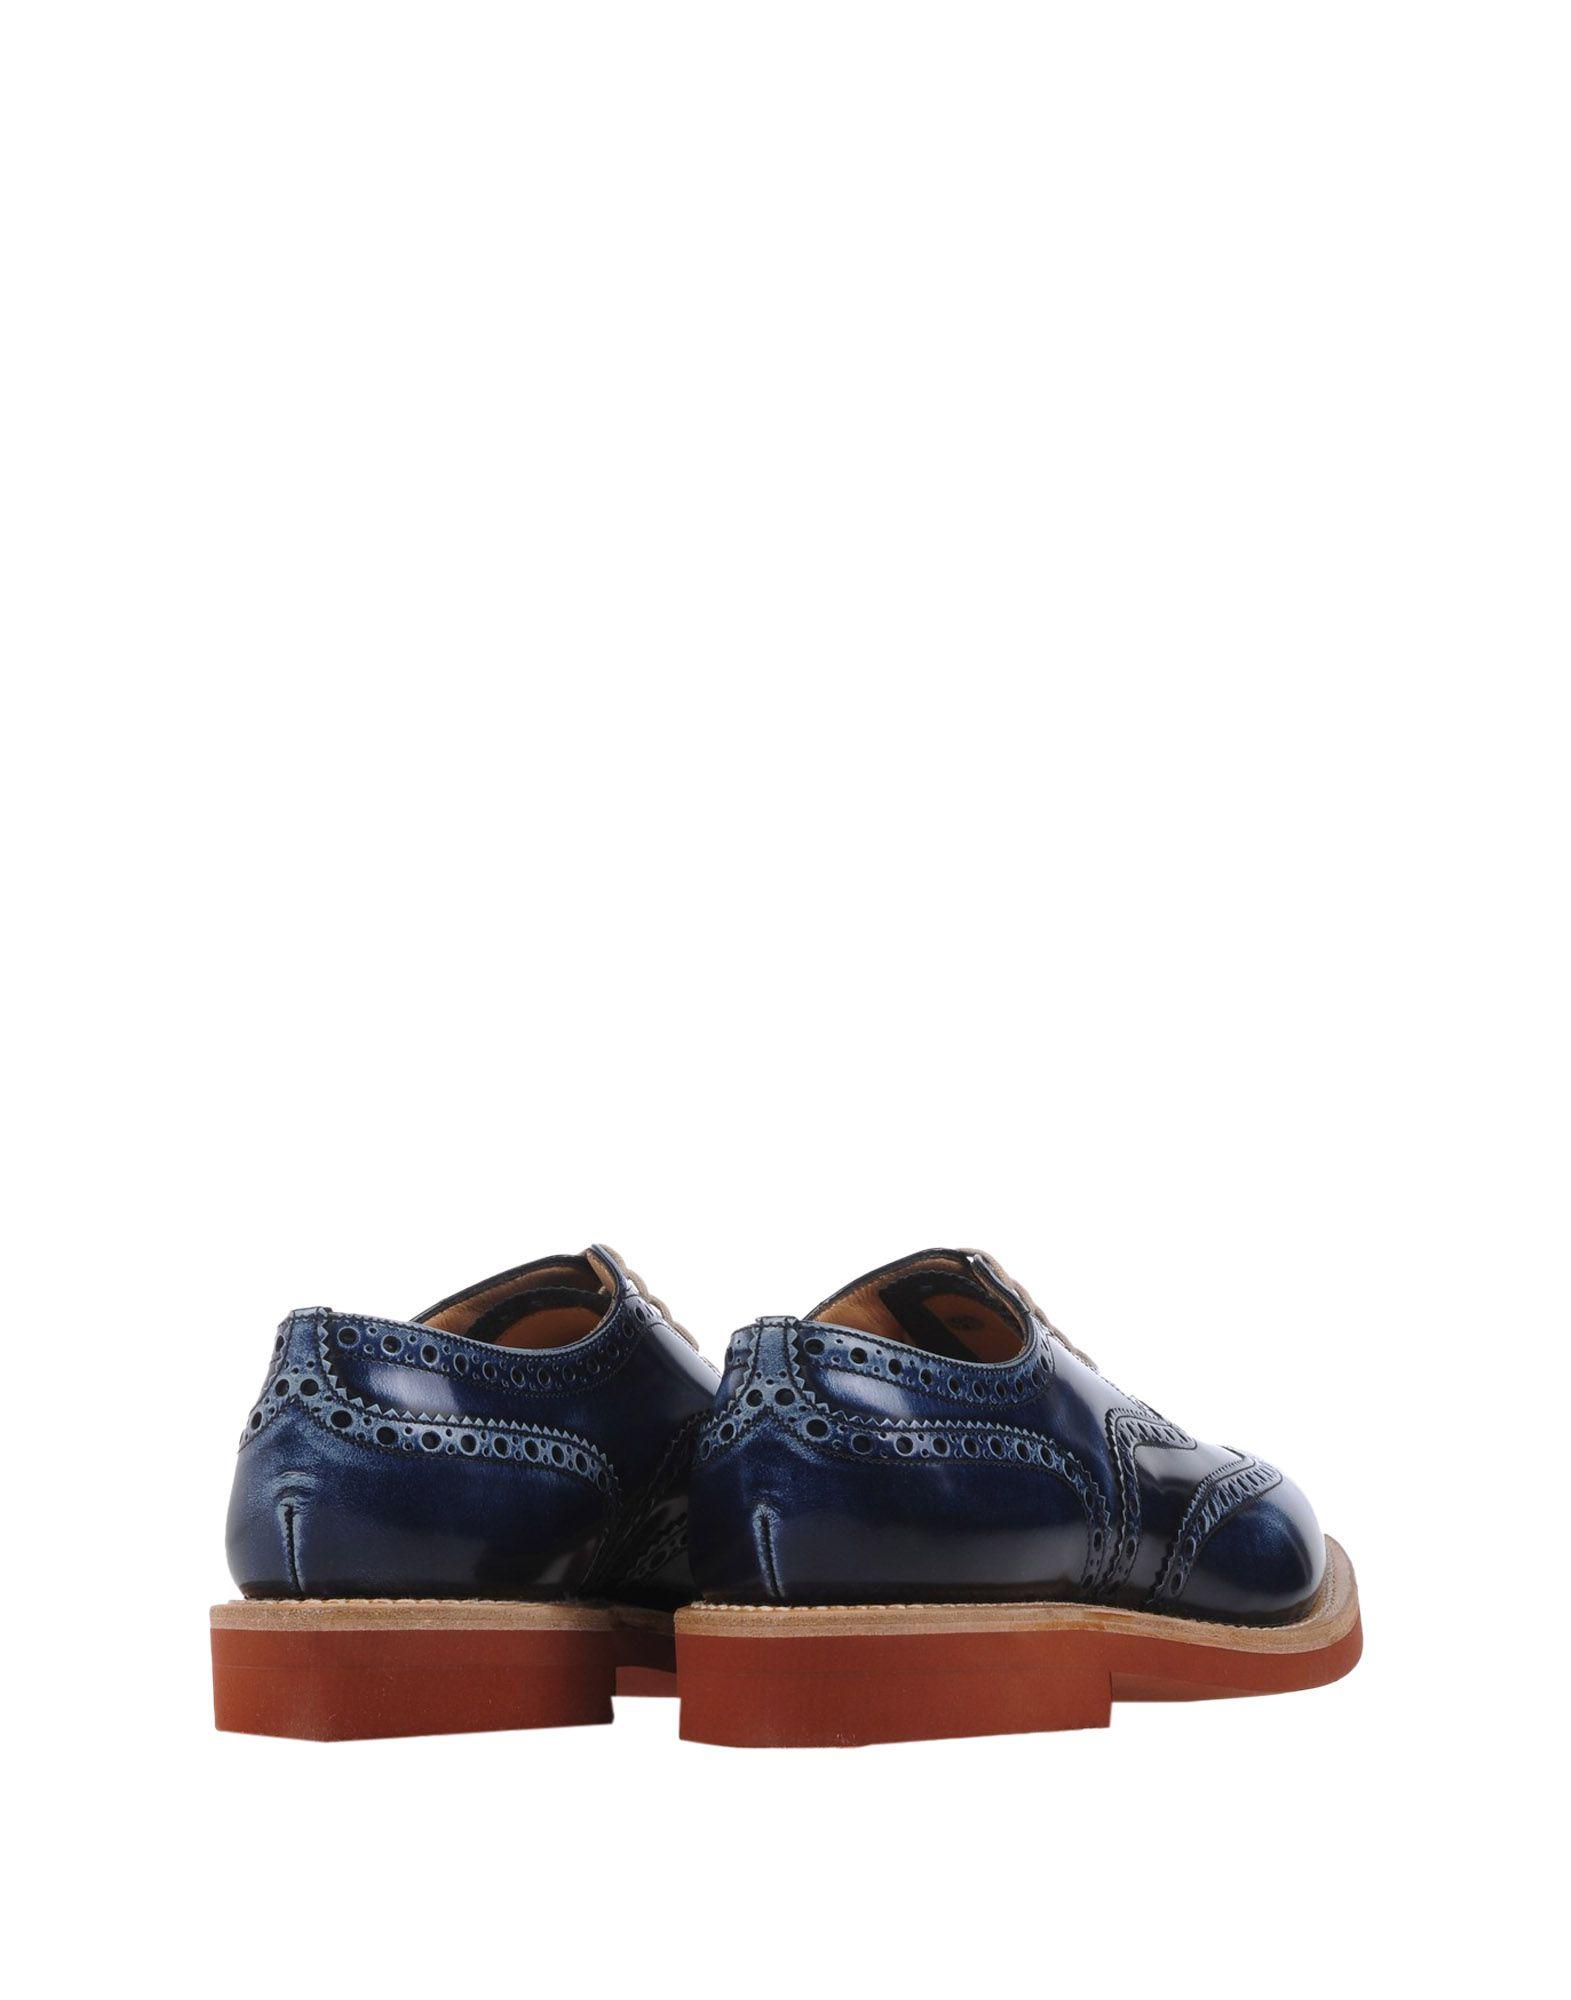 CHAUSSURES - BottinesAsfvlt Sneakers 8B4X9cQxmH